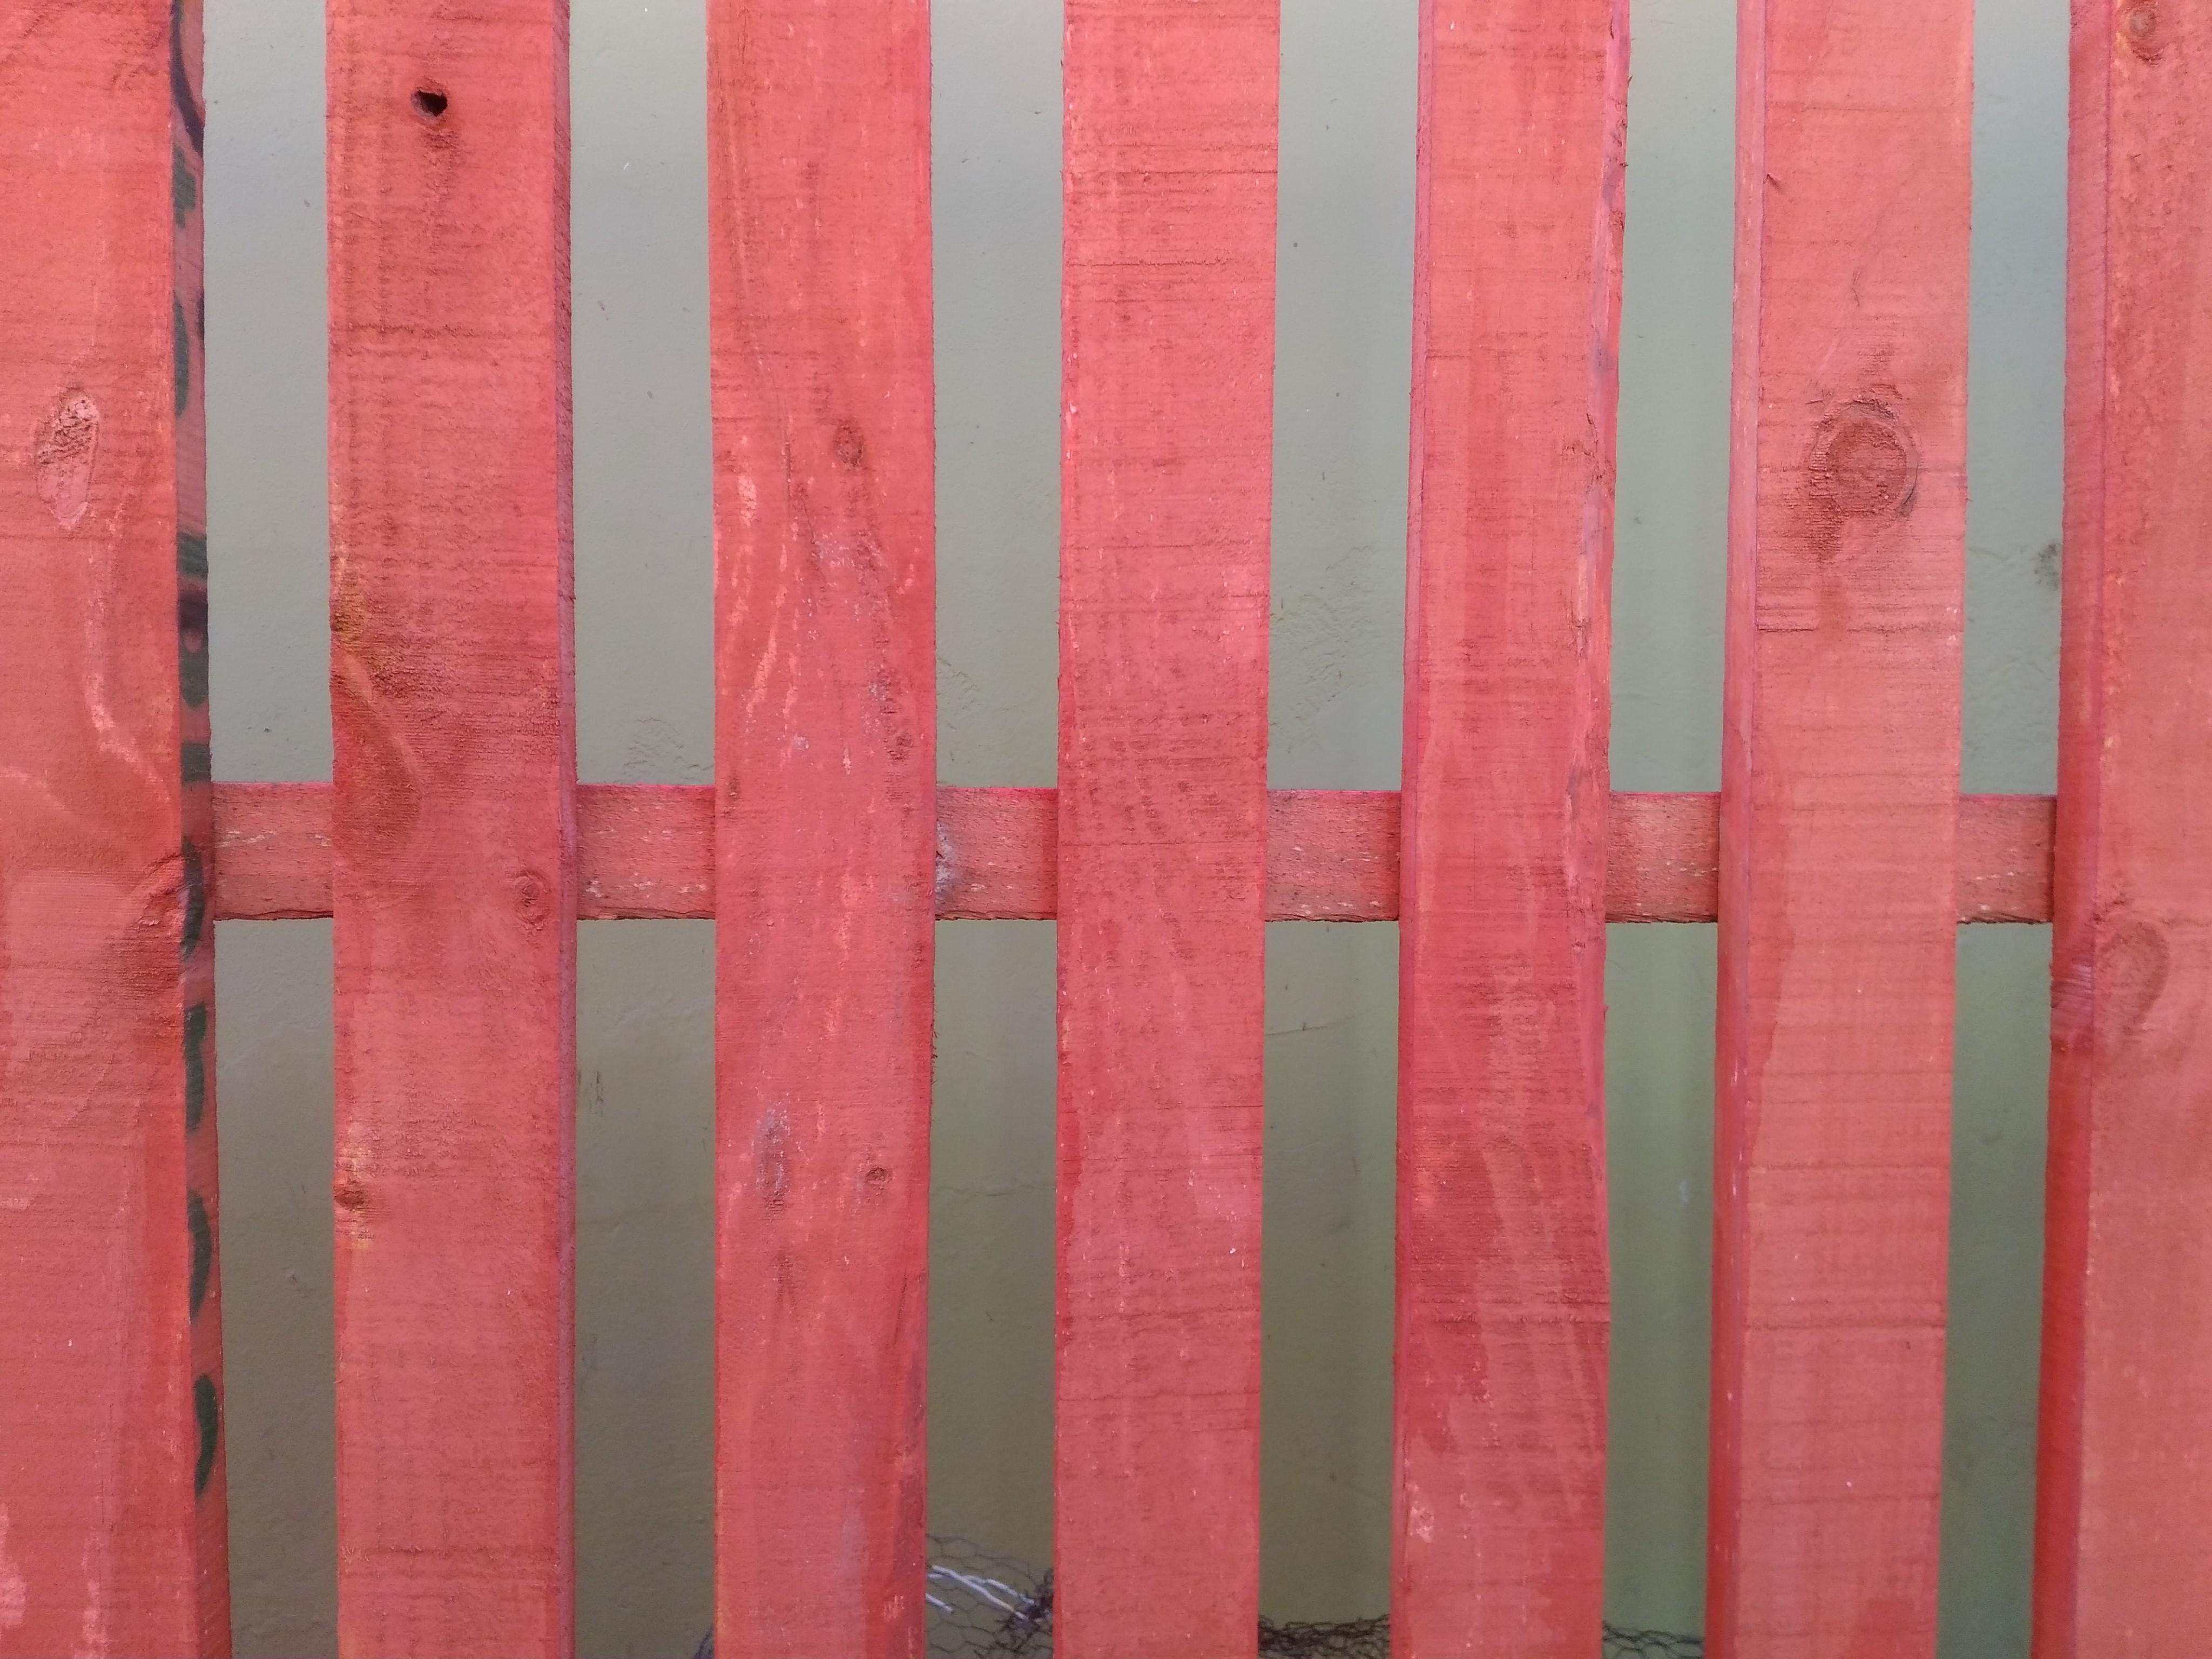 Kostenlose Foto Zaun Mauer Holz Rot Rosa Holzbeize Linie